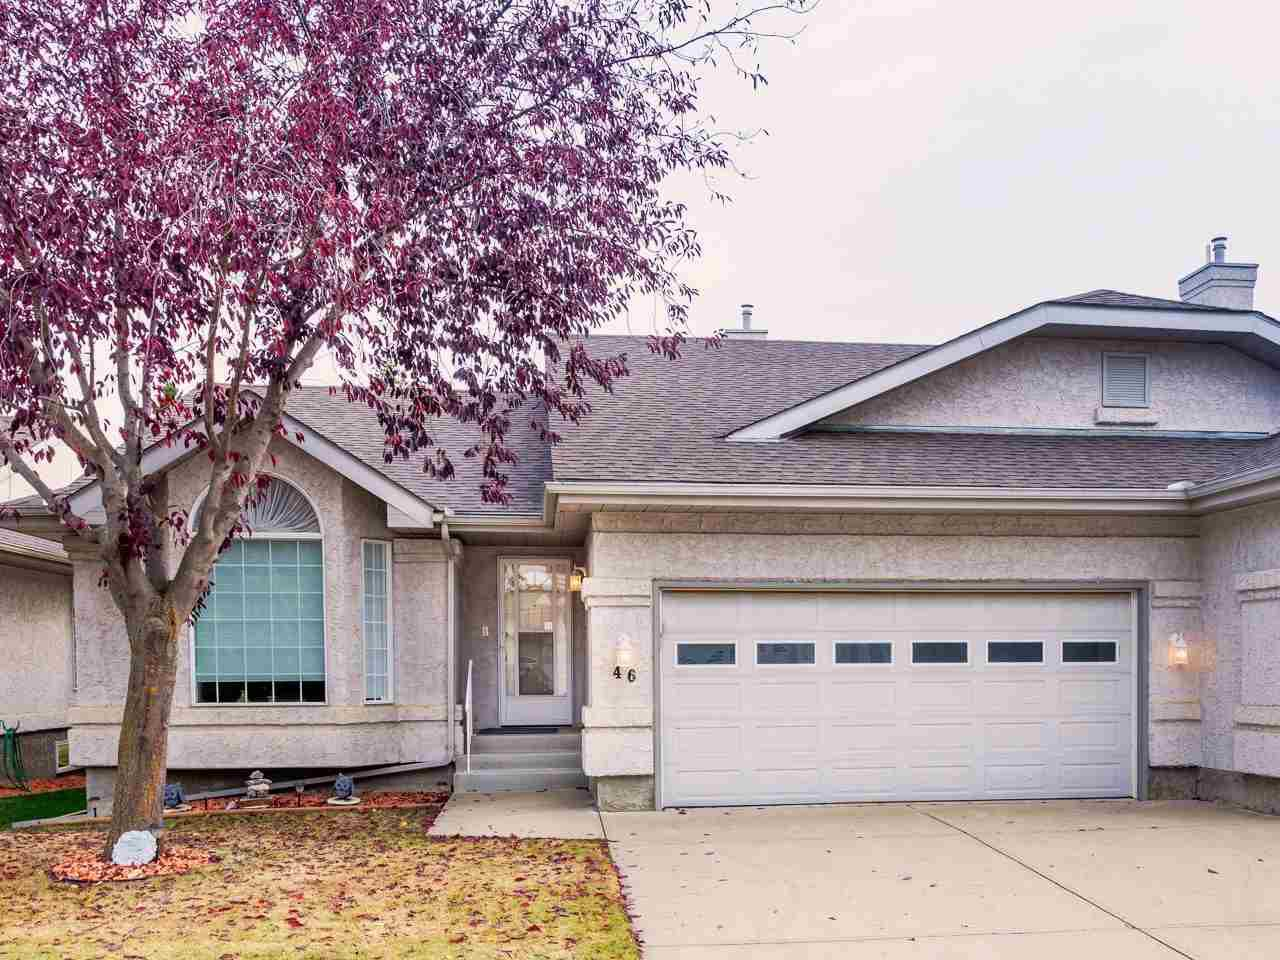 Main Photo: 46 303 TWIN BROOKS Drive in Edmonton: Zone 16 House Half Duplex for sale : MLS®# E4217635